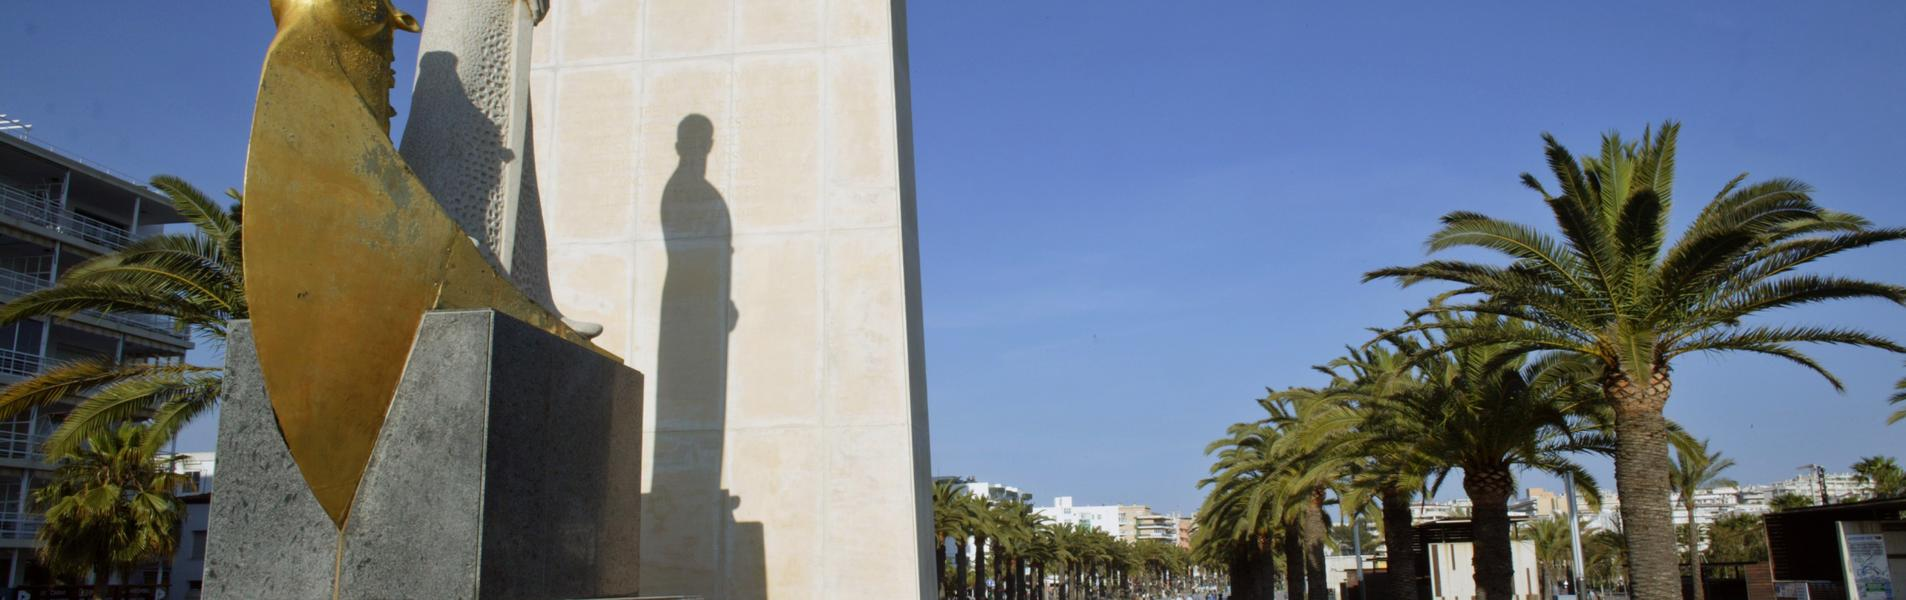 Monumento a Jaime I